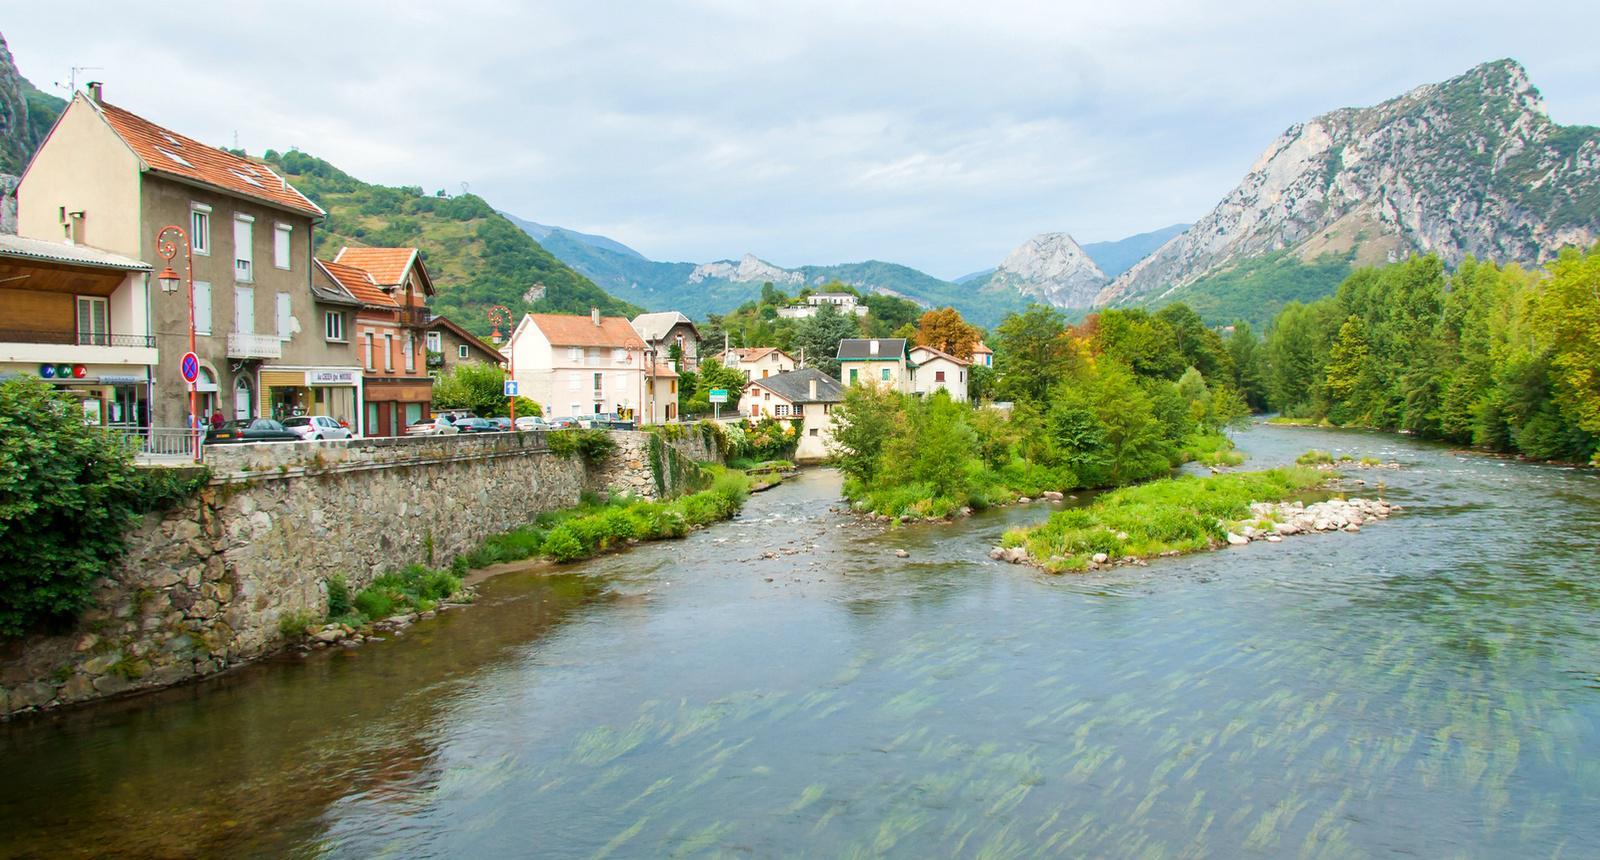 Tarascon-sur-Rhône